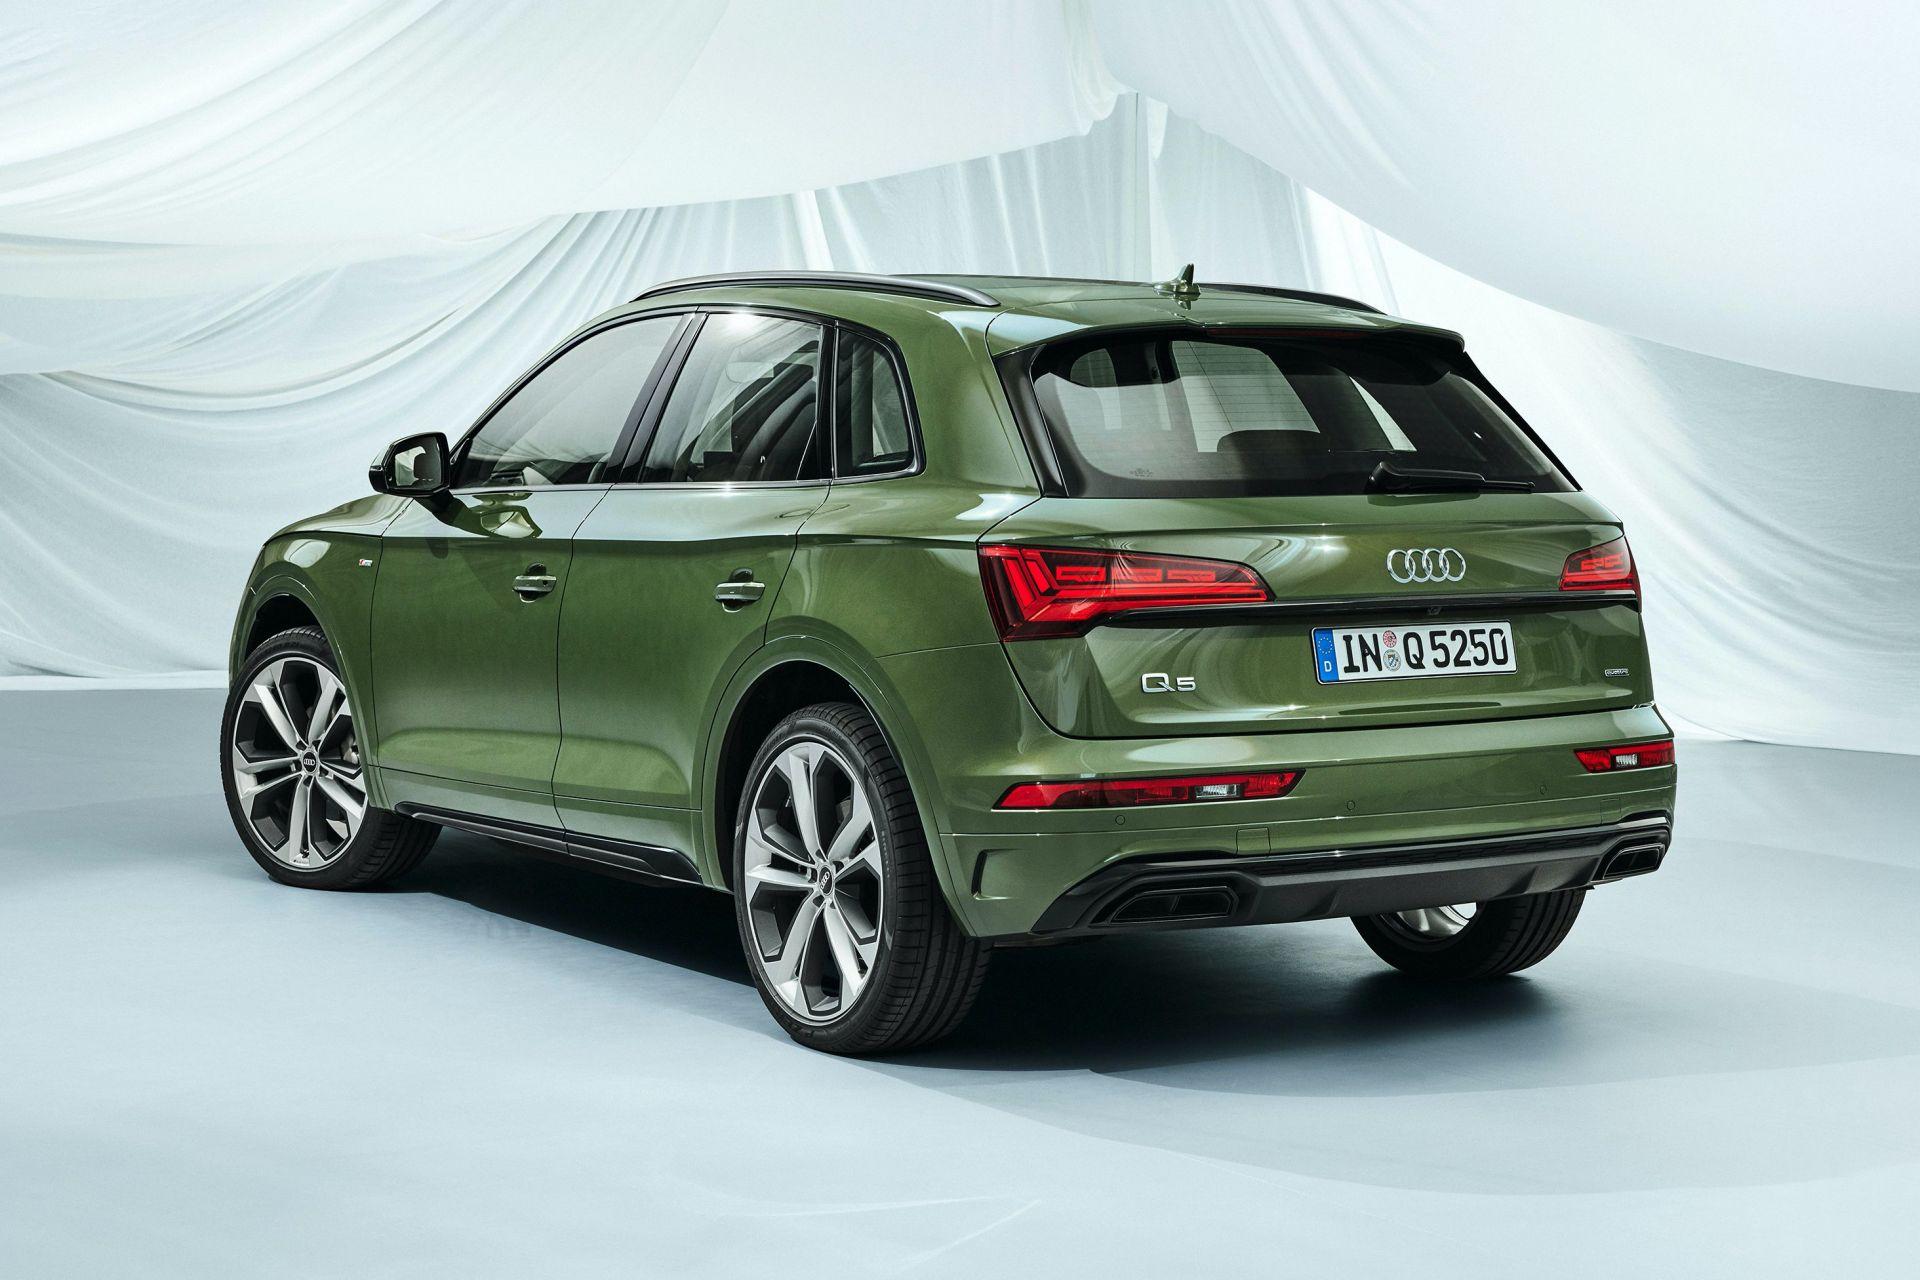 2021 Audi Q5 Debuts With Fresh Design and 12V Mild-Hybrid ...